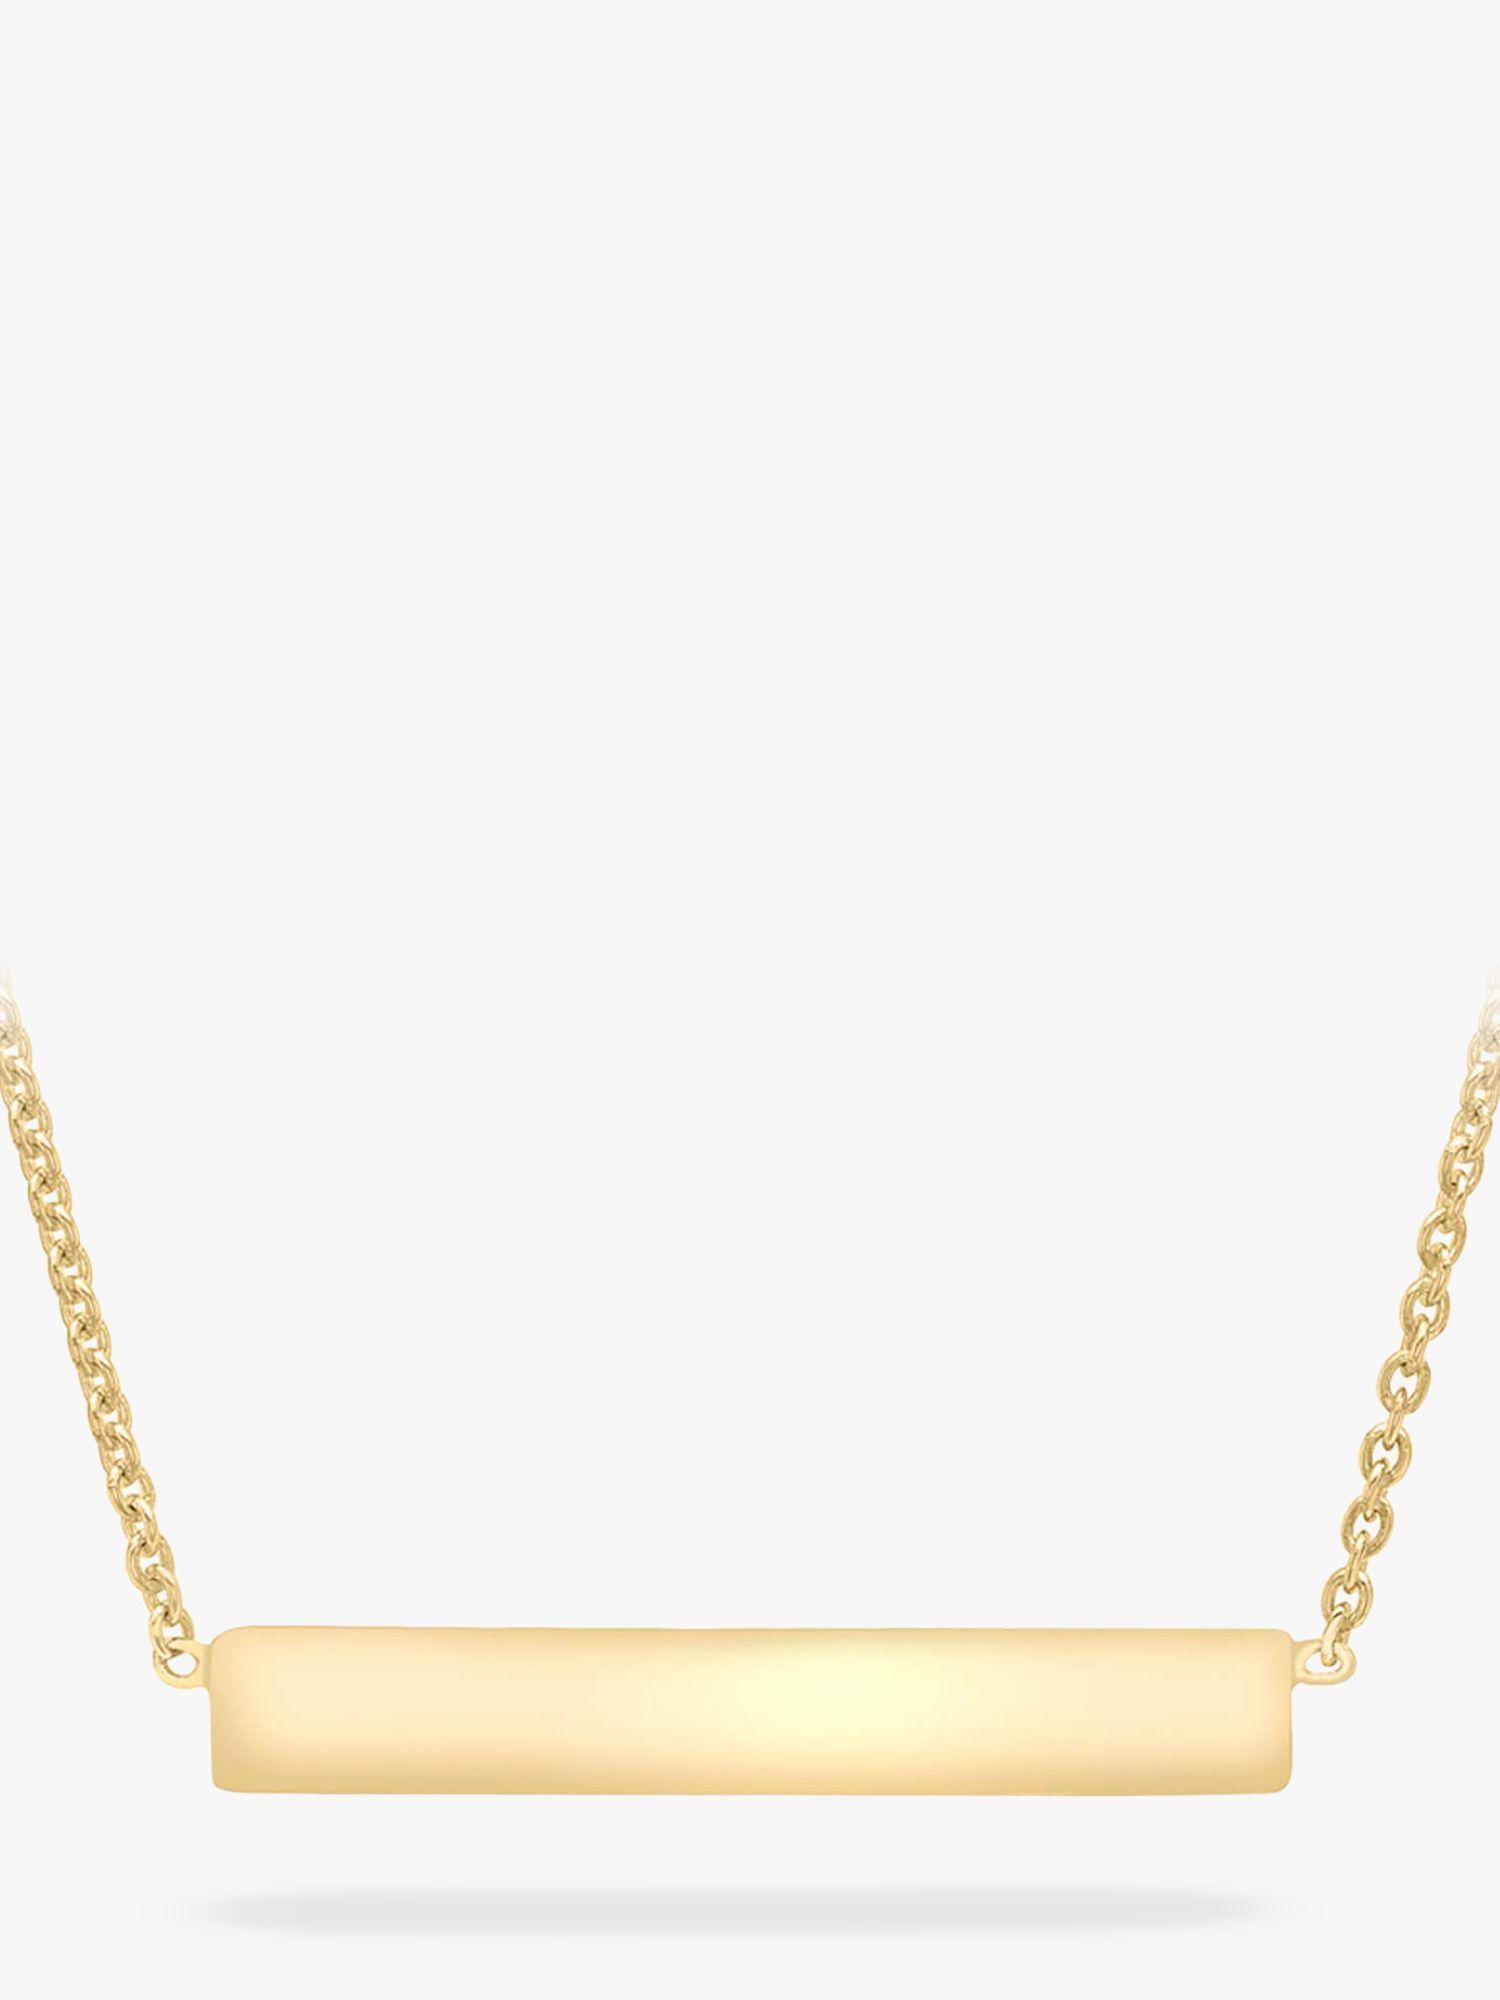 IBB IBB Personalised Small Horizontal Bar Initial Pendant Necklace, Gold